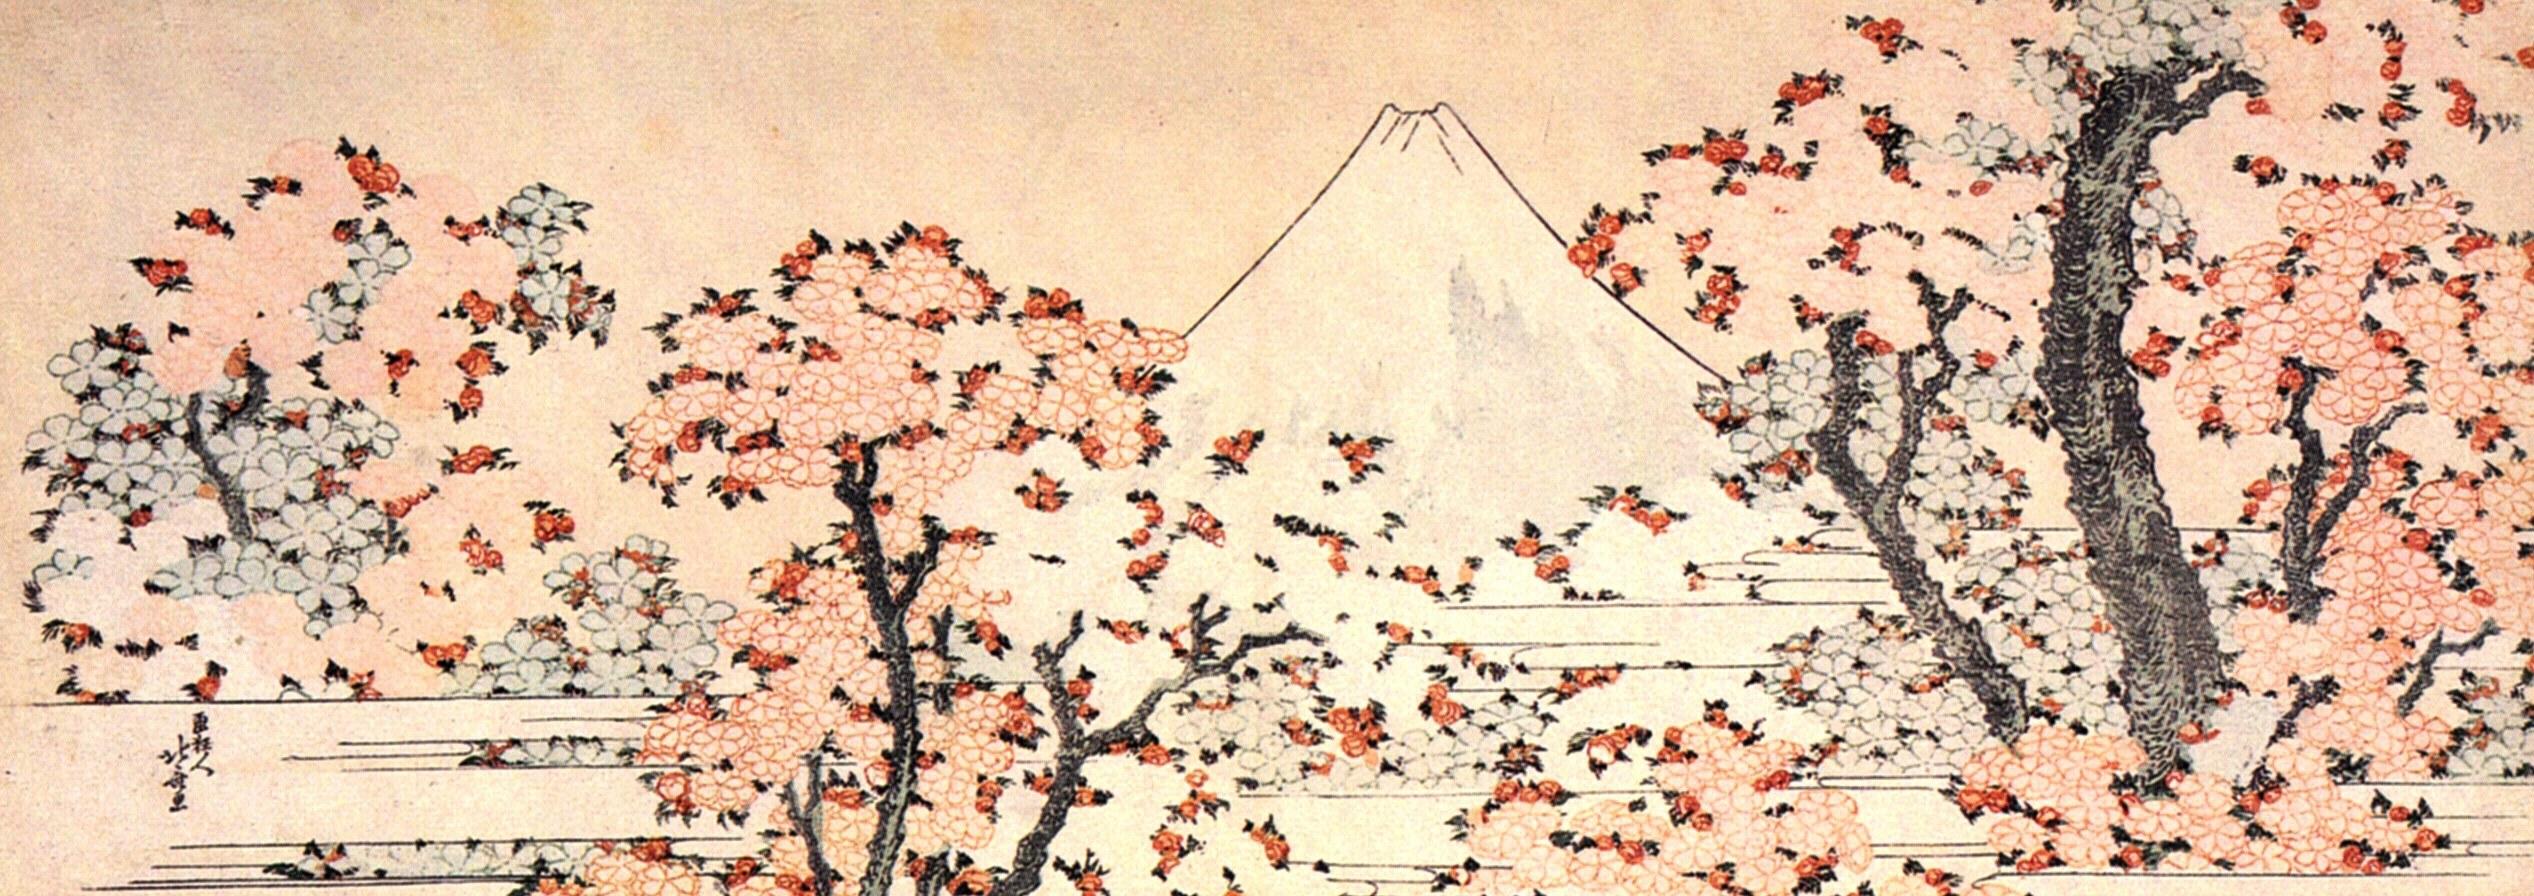 http://upload.wikimedia.org/wikipedia/commons/4/49/Mount_Fuji_seen_throught_cherry_blossom.jpg